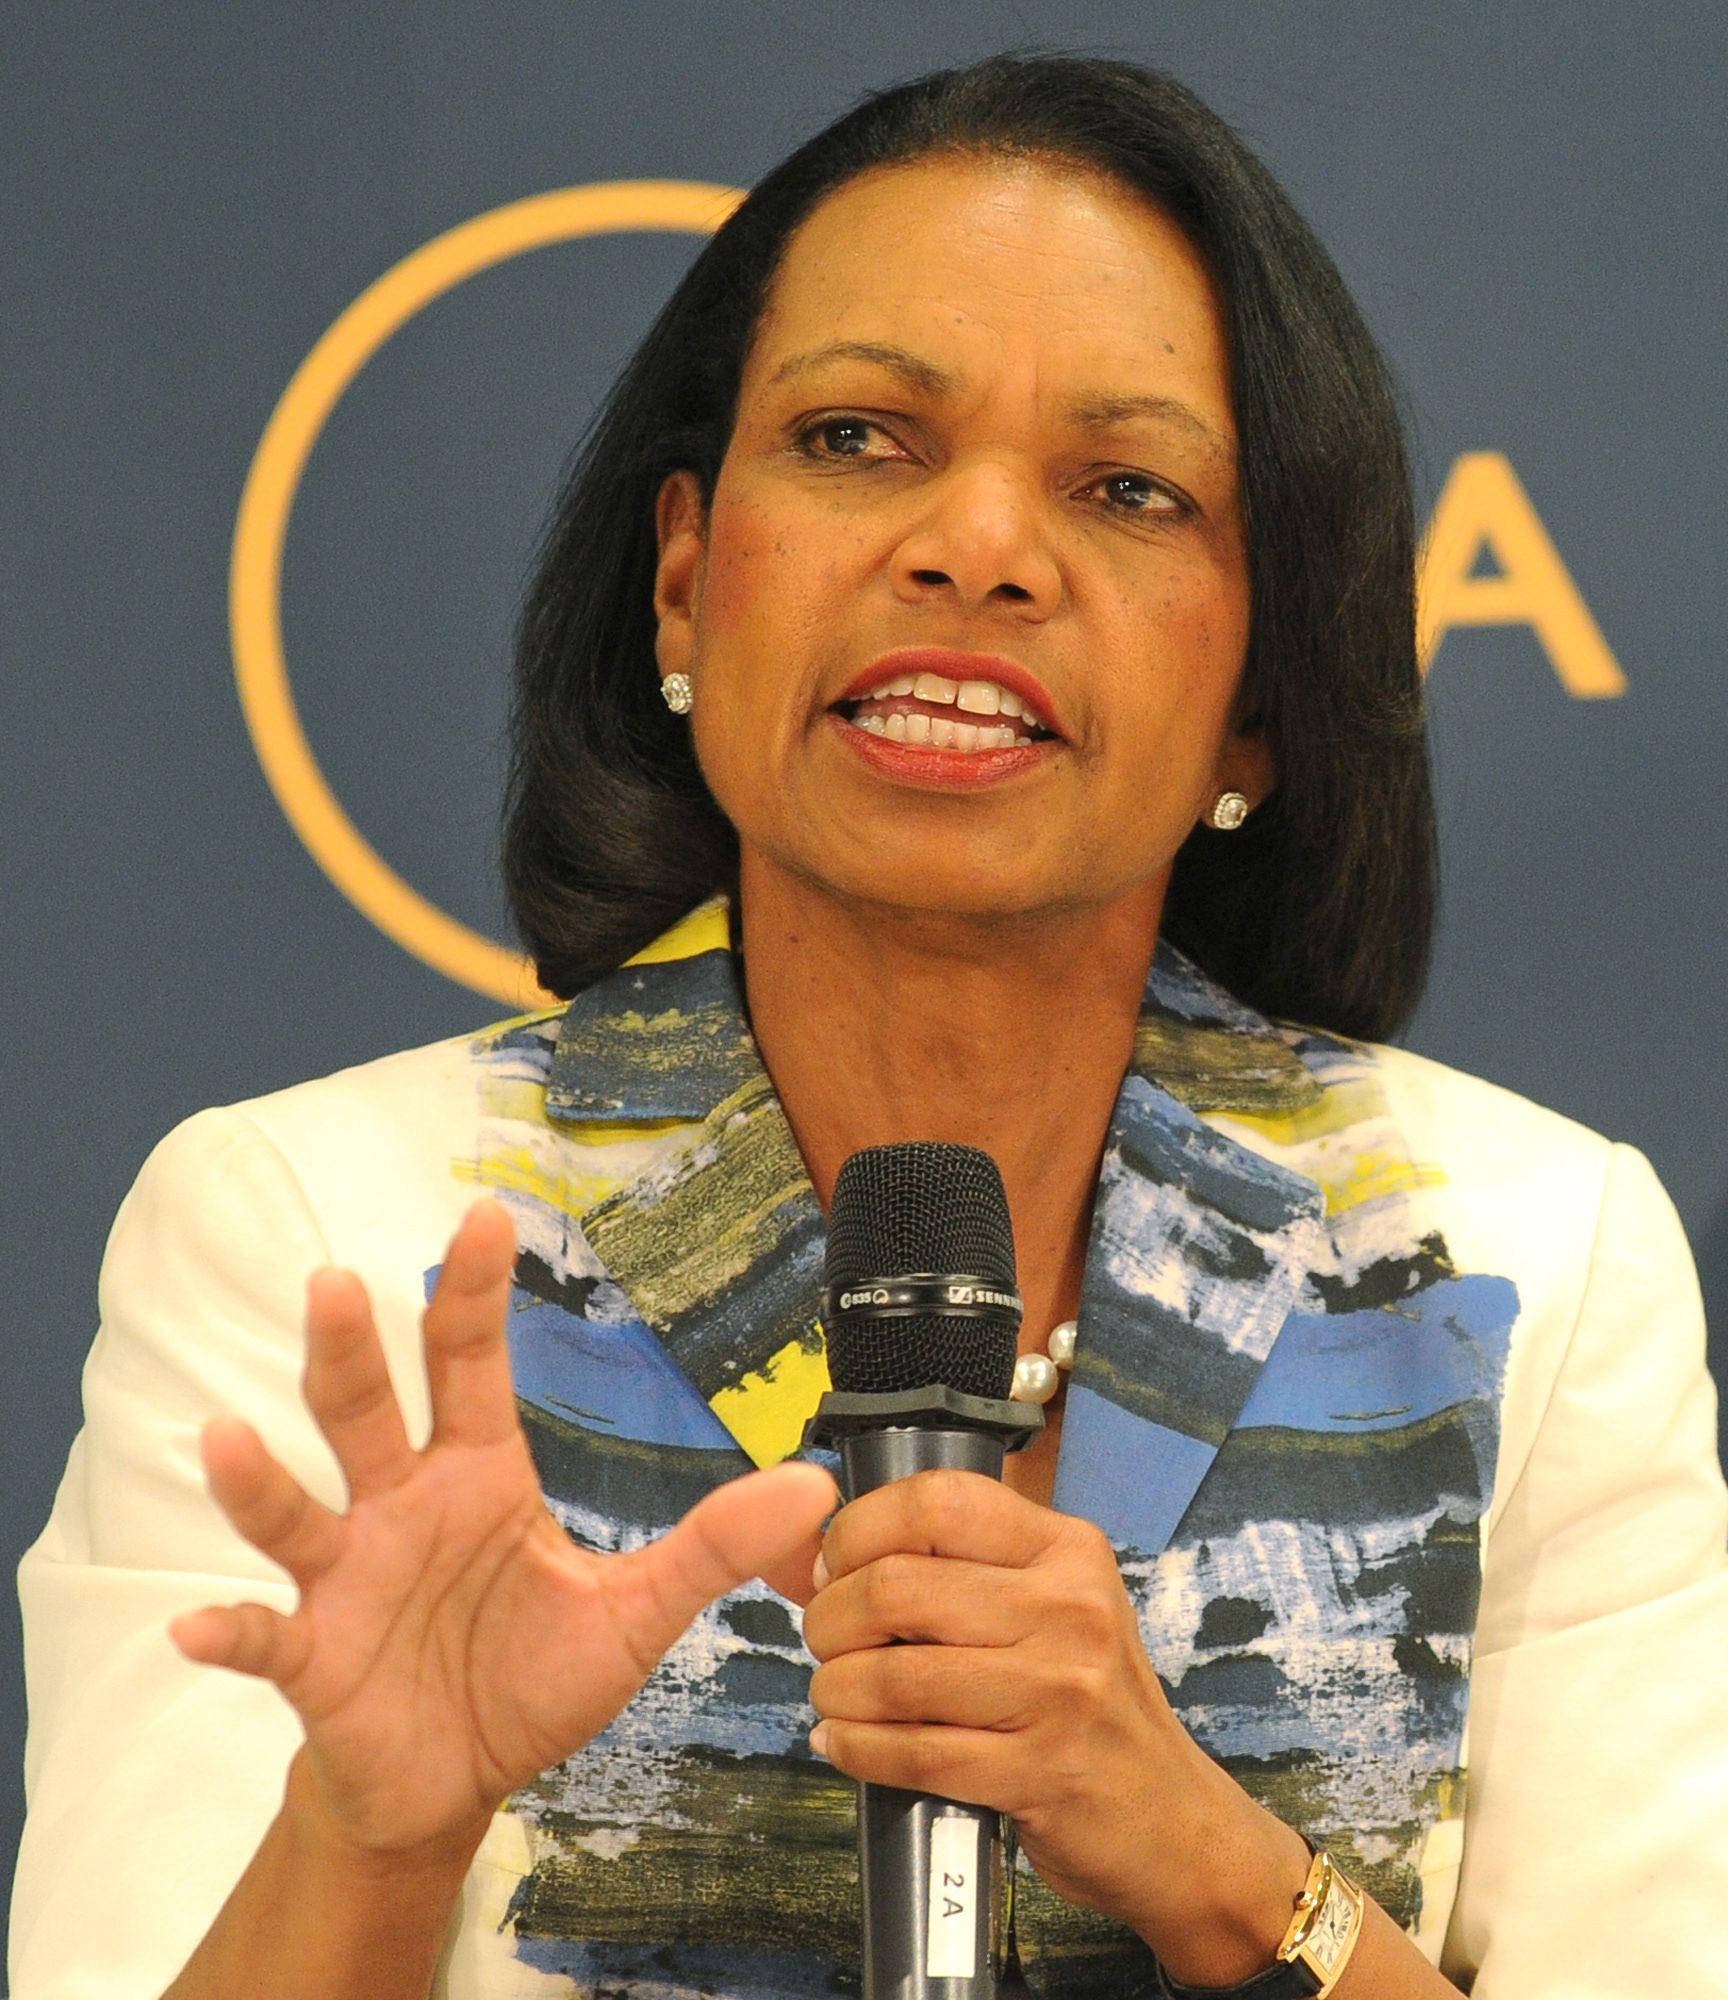 FIKK NOK: Tidligere utenriksminister Condoleezza Rice er blant de profilerte republikanerne som nå har trukket sin støtte til kandidat Trump. FOTO: AP Photo/Alik Keplicz